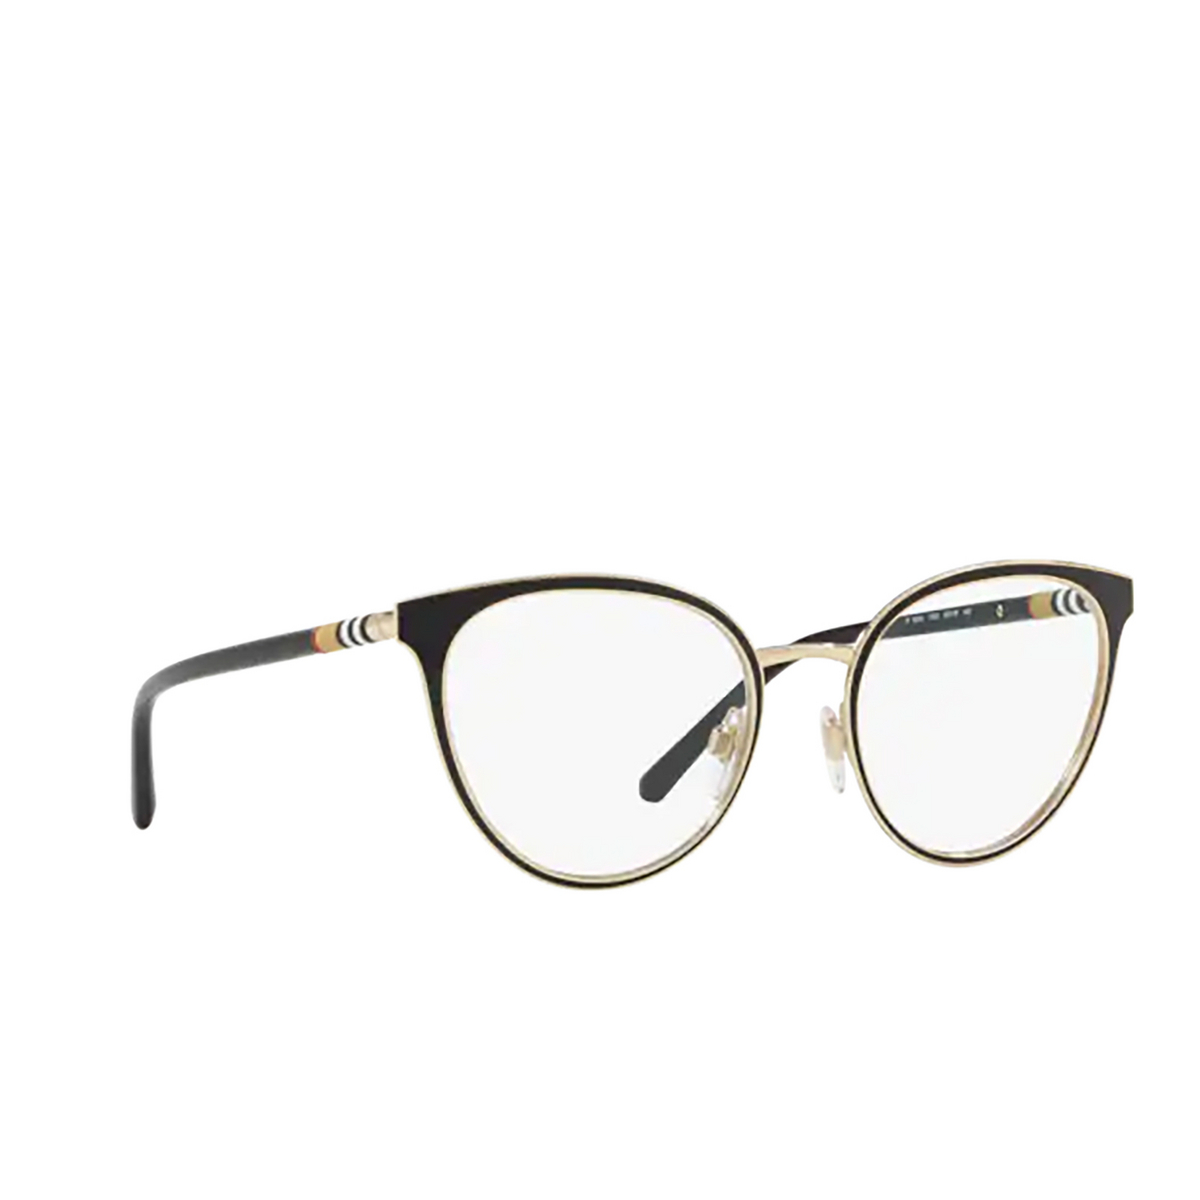 Burberry® Cat-eye Eyeglasses: BE1324 color Black / Light Gold 1262 - three-quarters view.